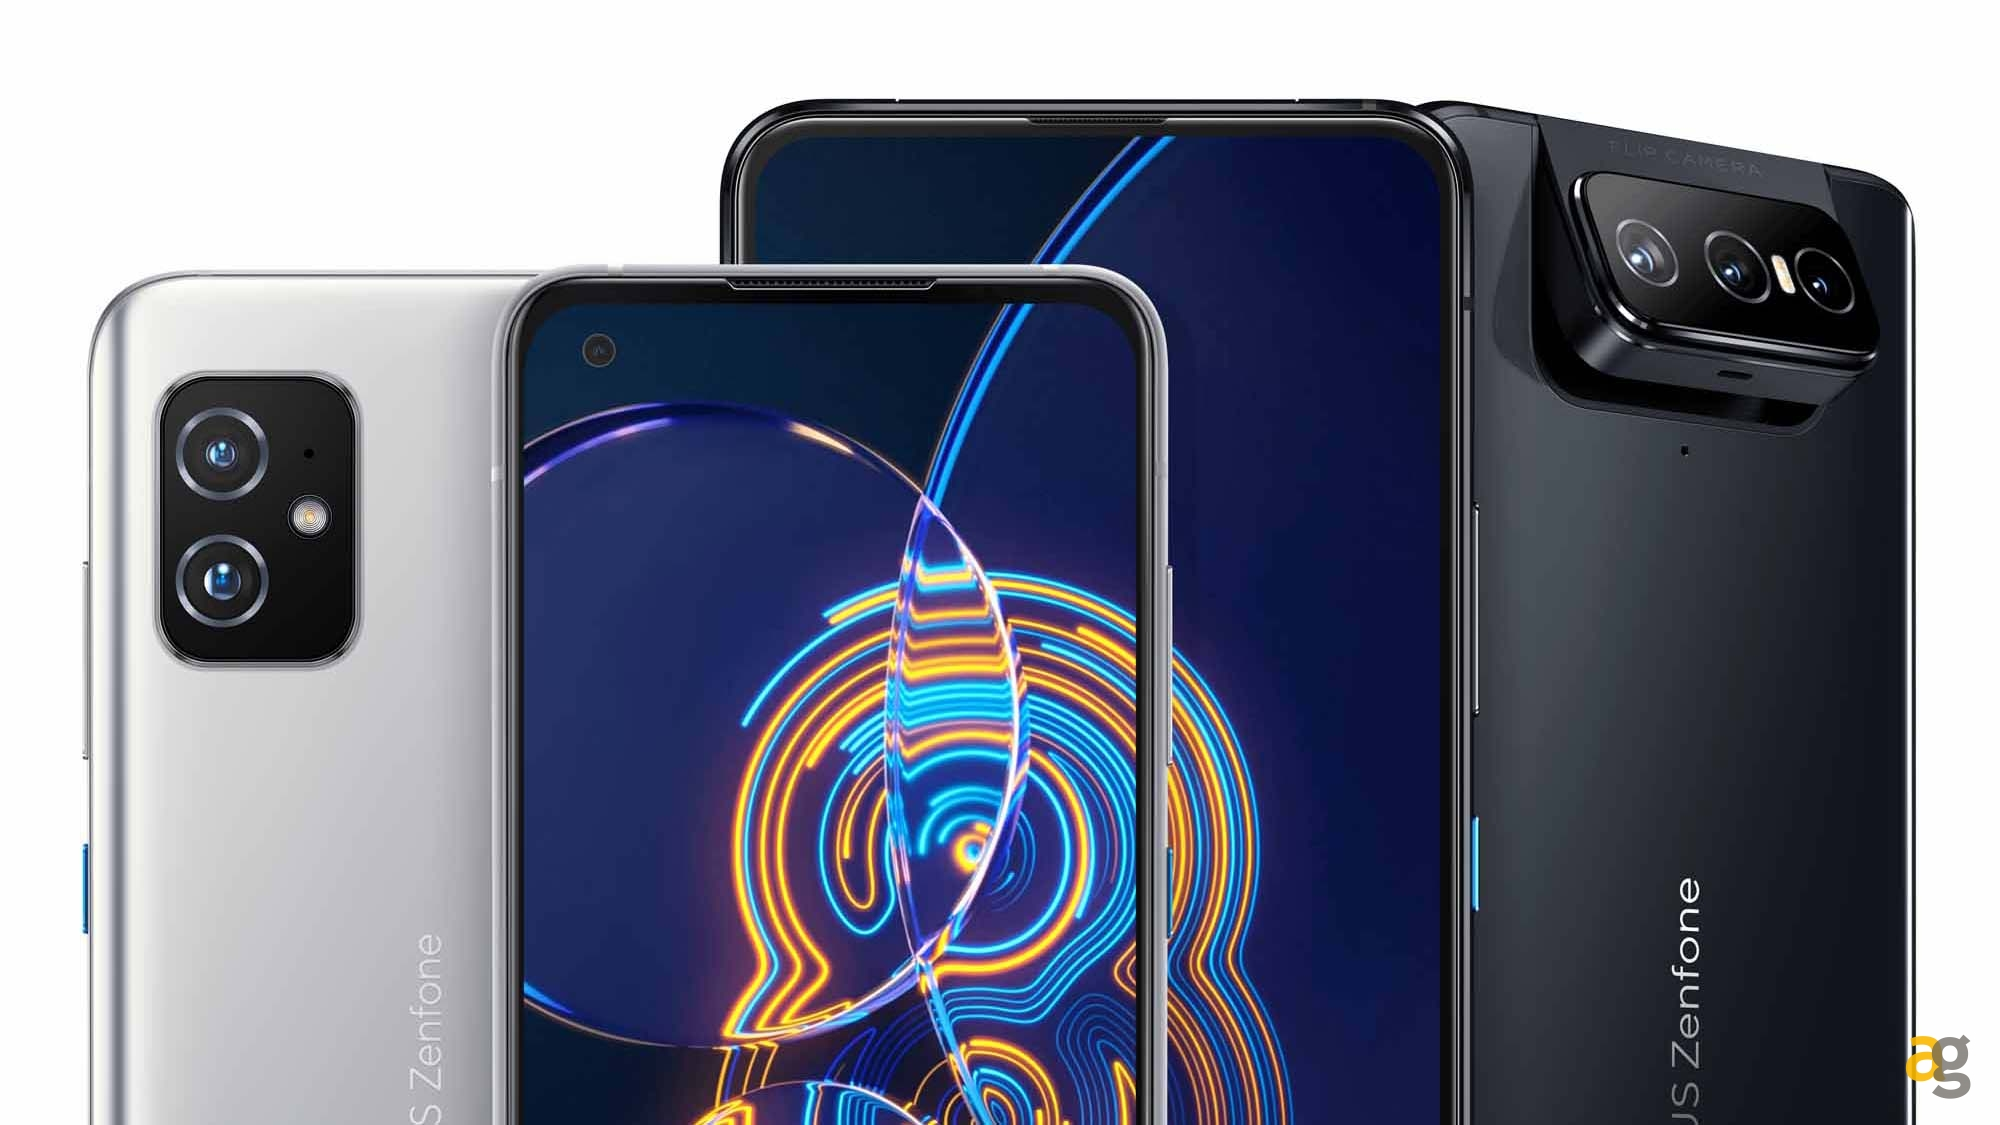 Zenfone 8_Zenfone 8 Flip